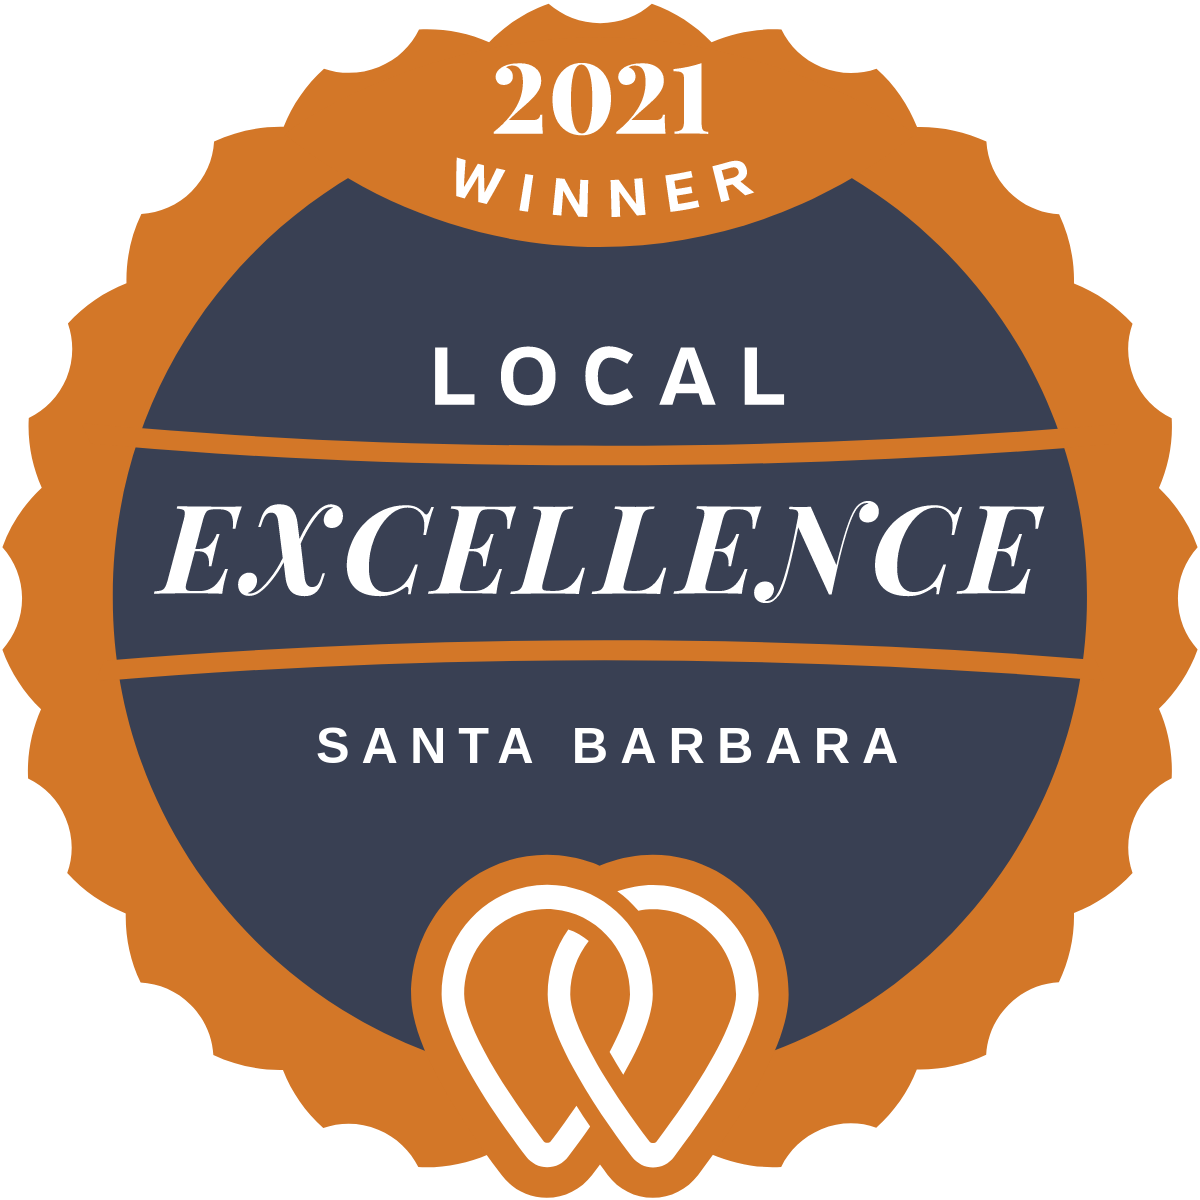 2021 Local Excellence Winner in Santa Barbara, CA